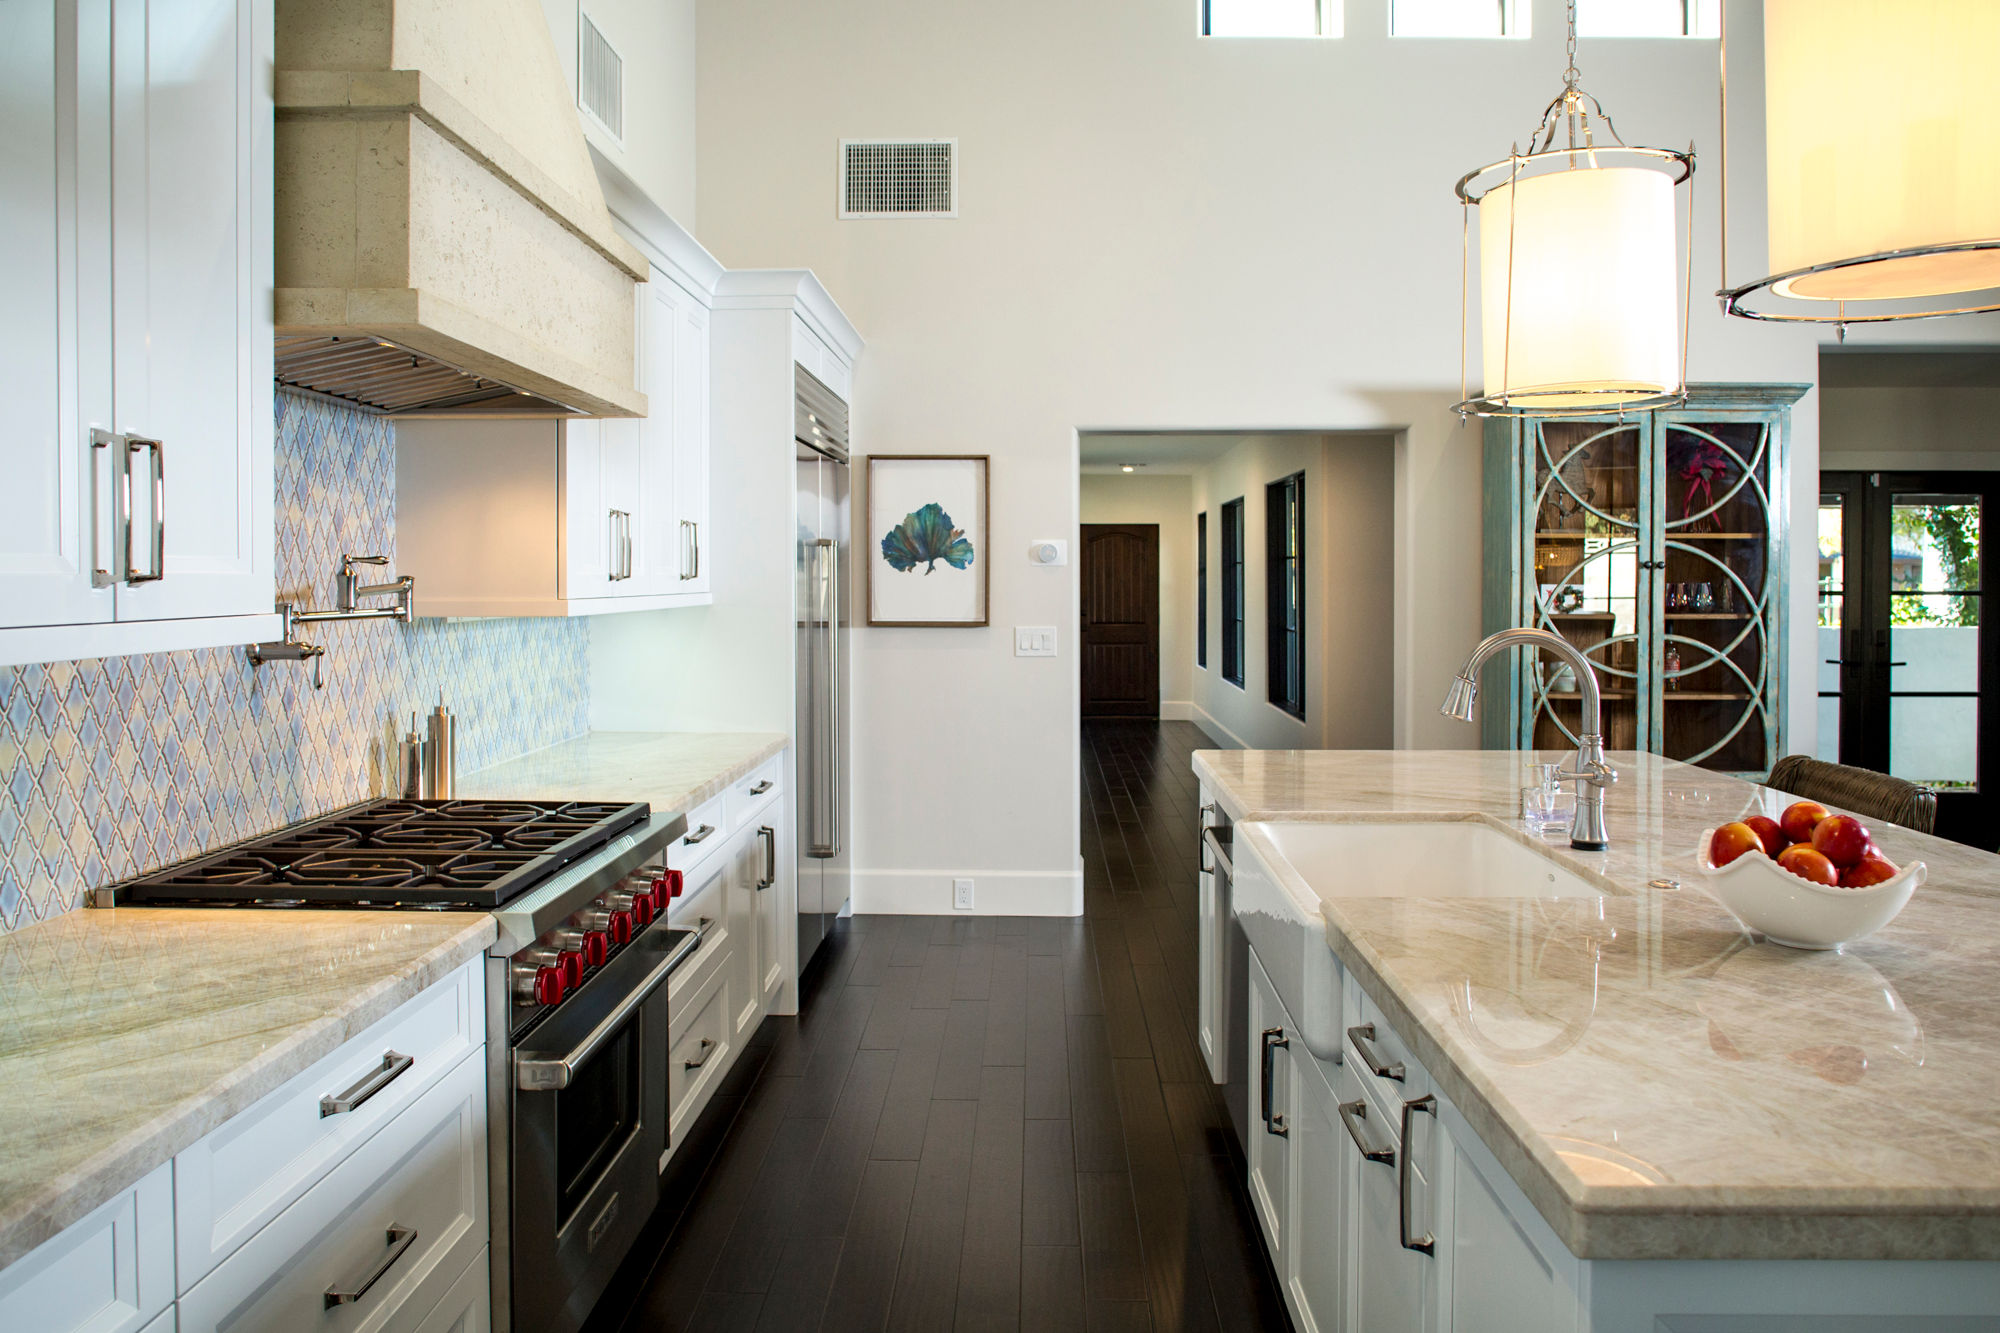 White Santa Barbara styled kitchen, stone stove hood, dark wood floors, large pendents over island.